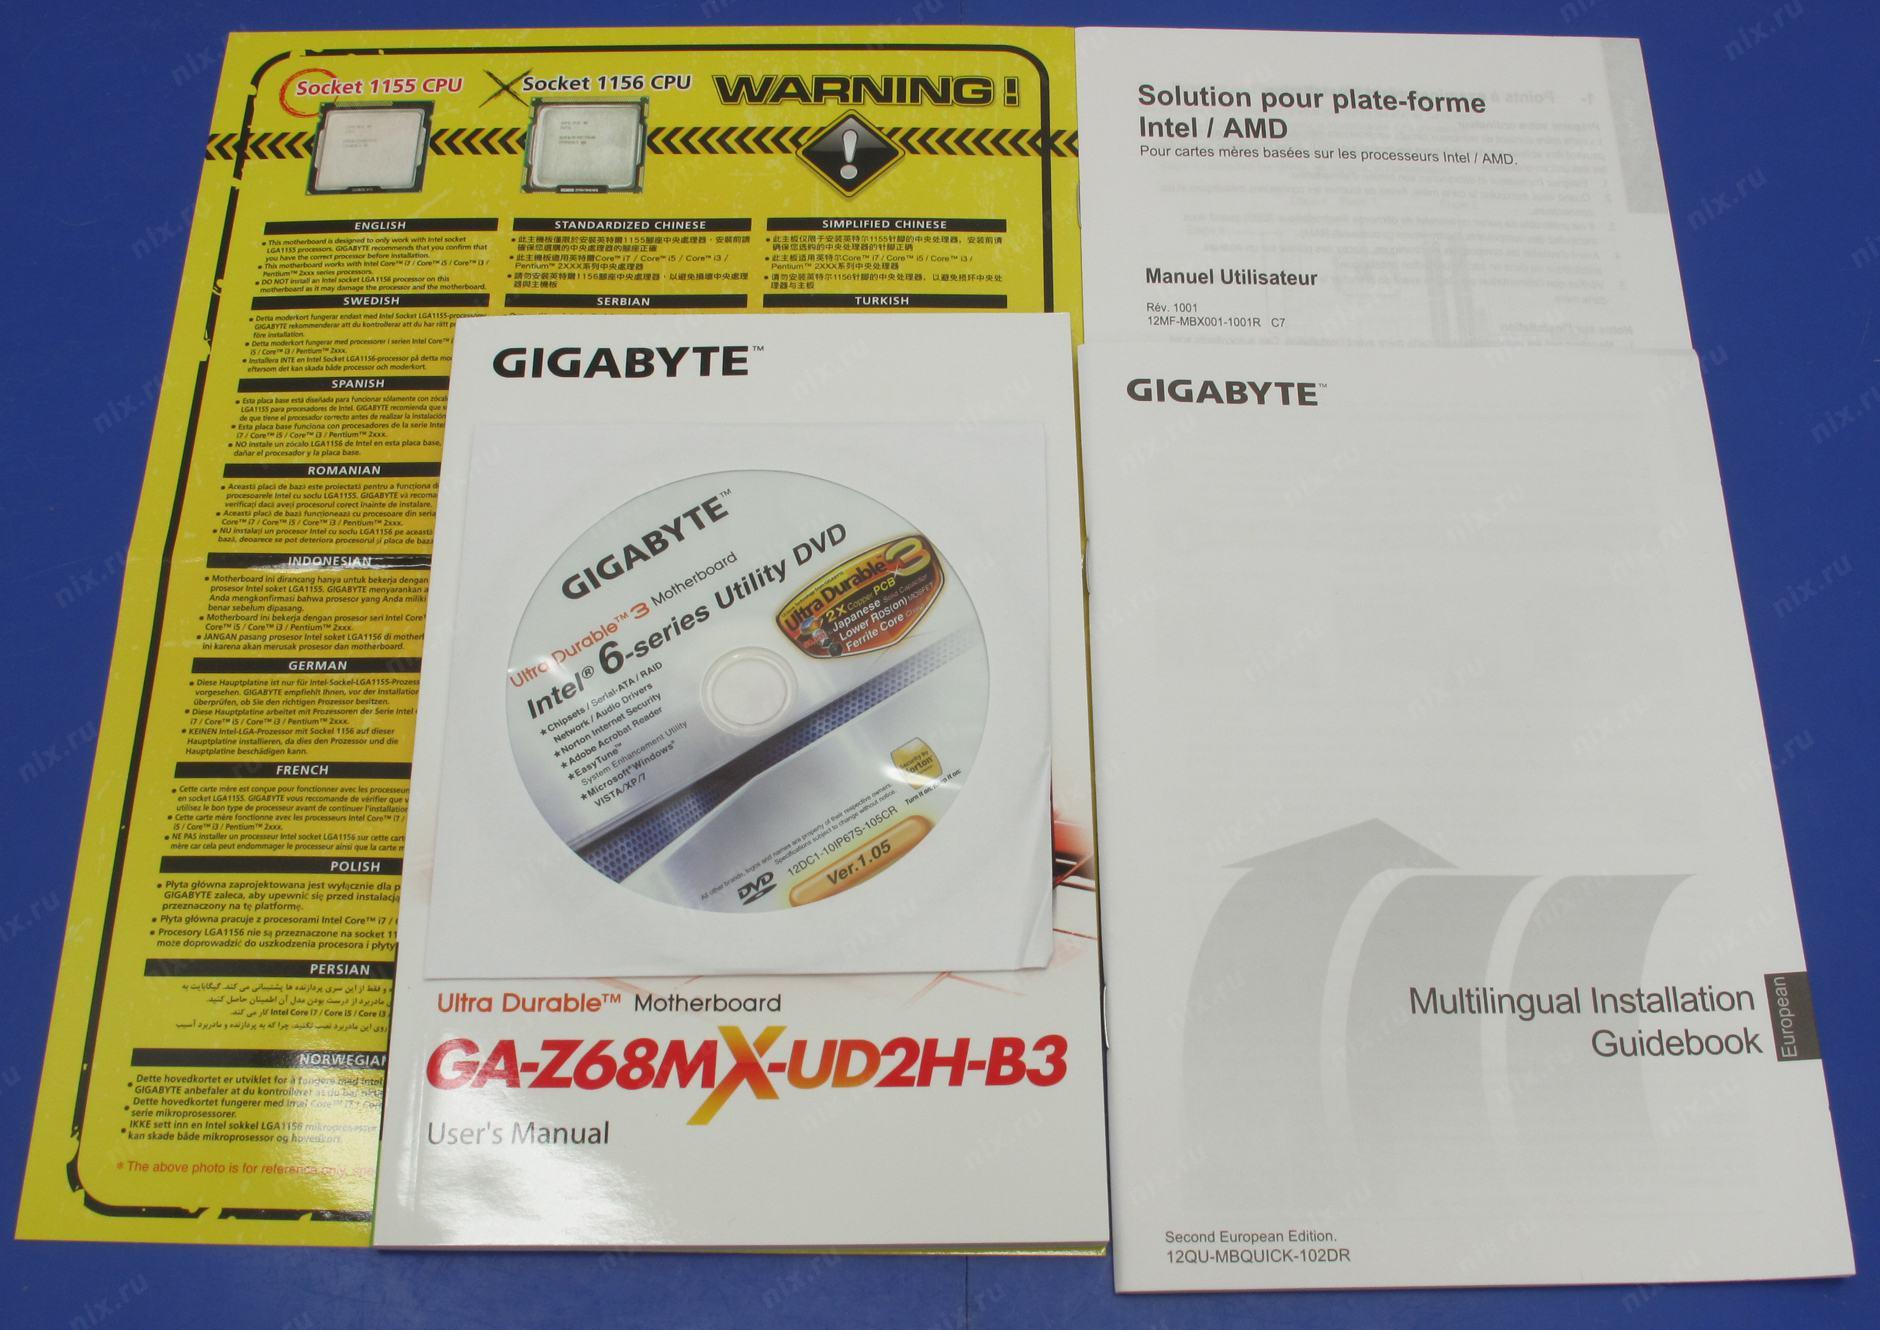 Driver UPDATE: Gigabyte GA-Z68MX-UD2H-B3 Marvel RAID